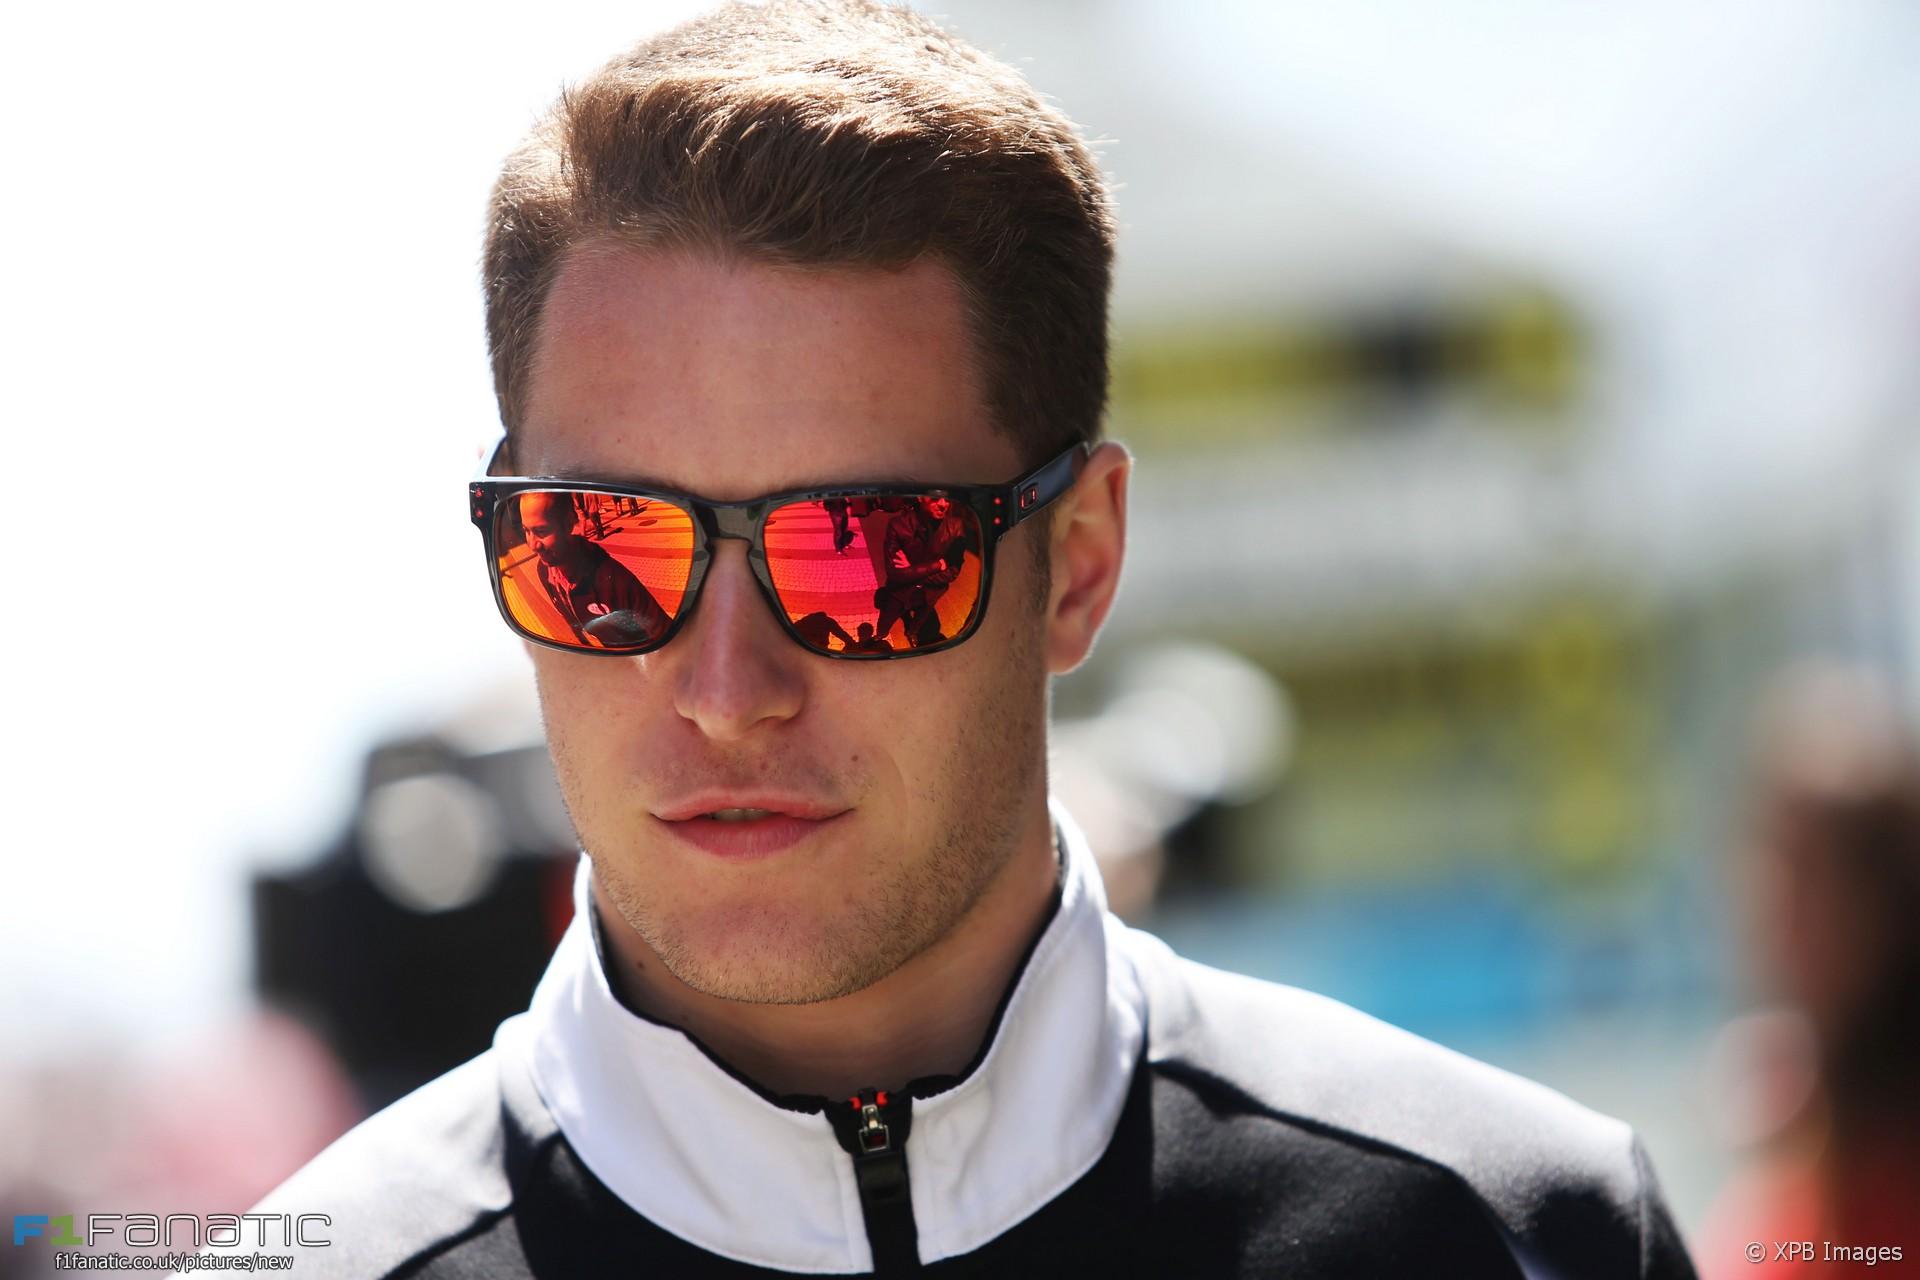 Stoffel Vandoorne, McLaren, Sochi Autodrom, 2016